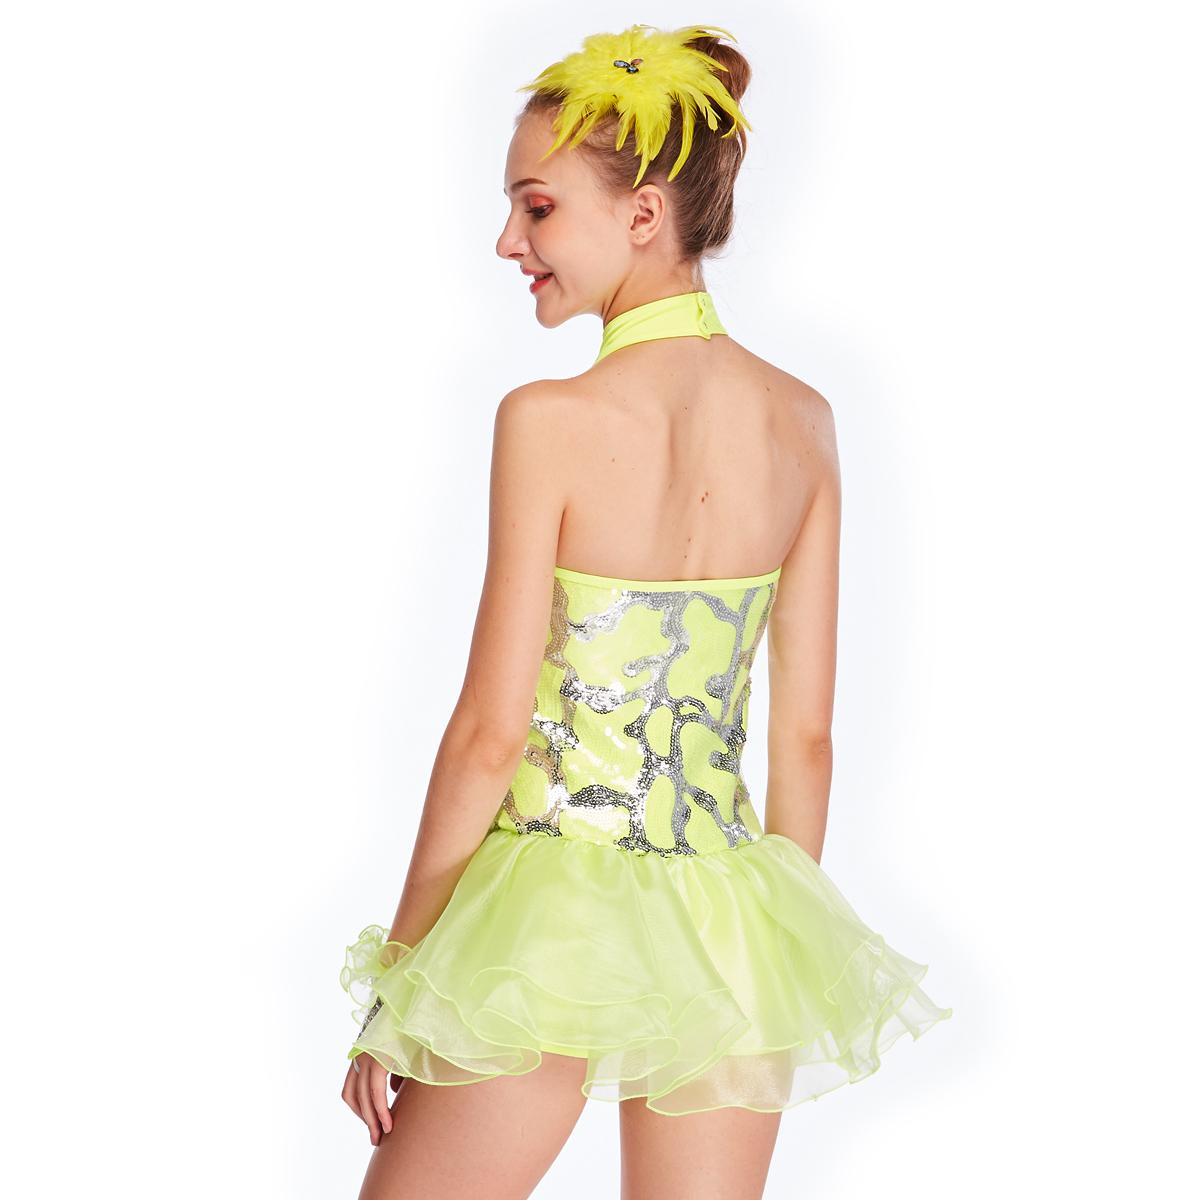 MIDEE comfortable ballet outfits factory price dance school-2